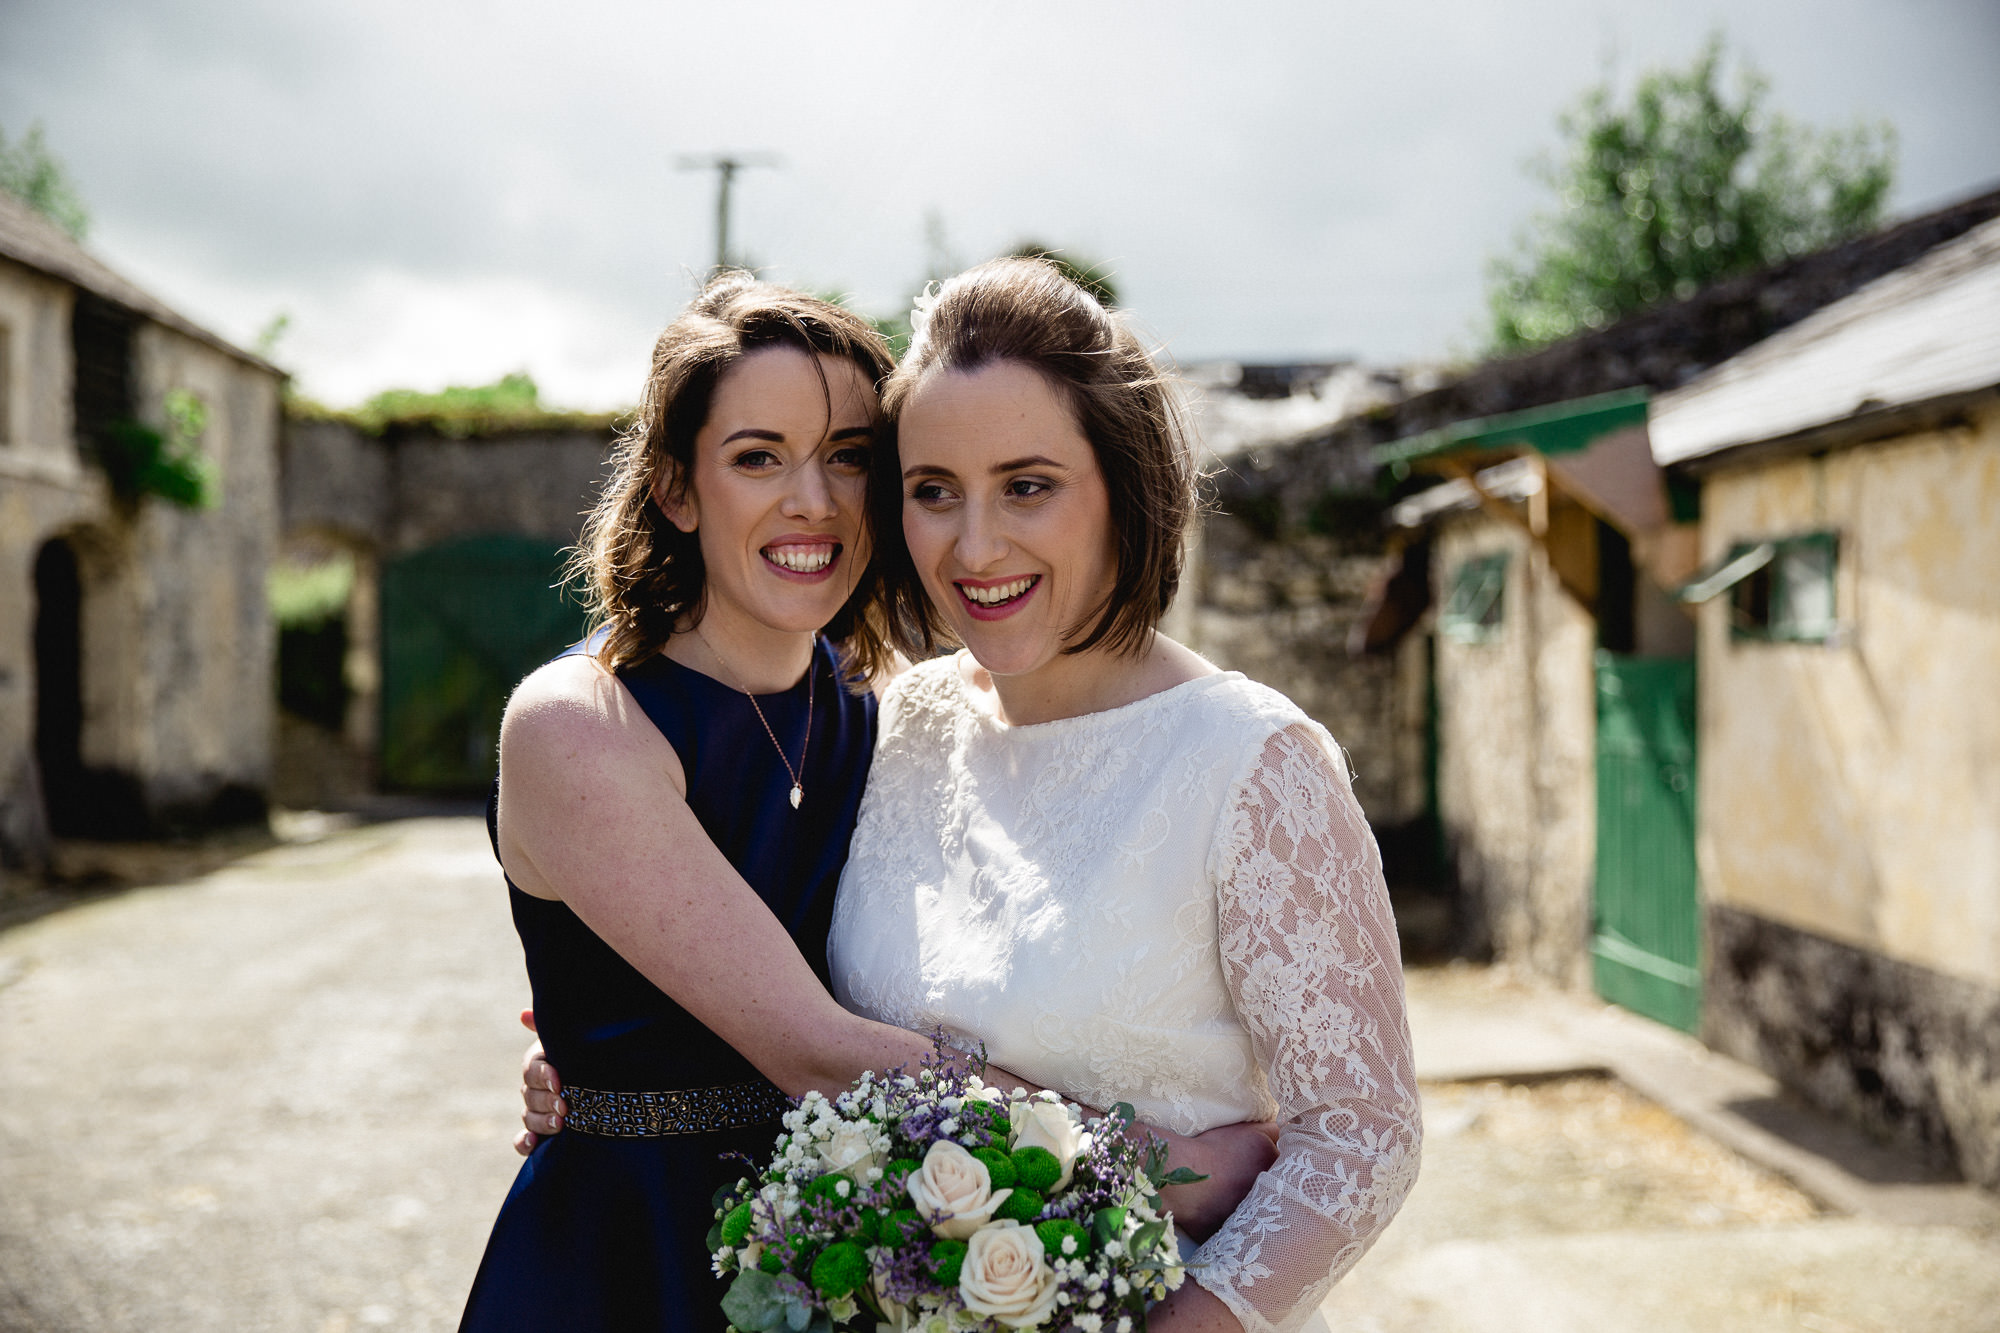 CLAIREBYRNEPHOTOGRAPHY-WEDDING-Ireland-cloncody-alternative-fun-Jen-Helena-14.jpg